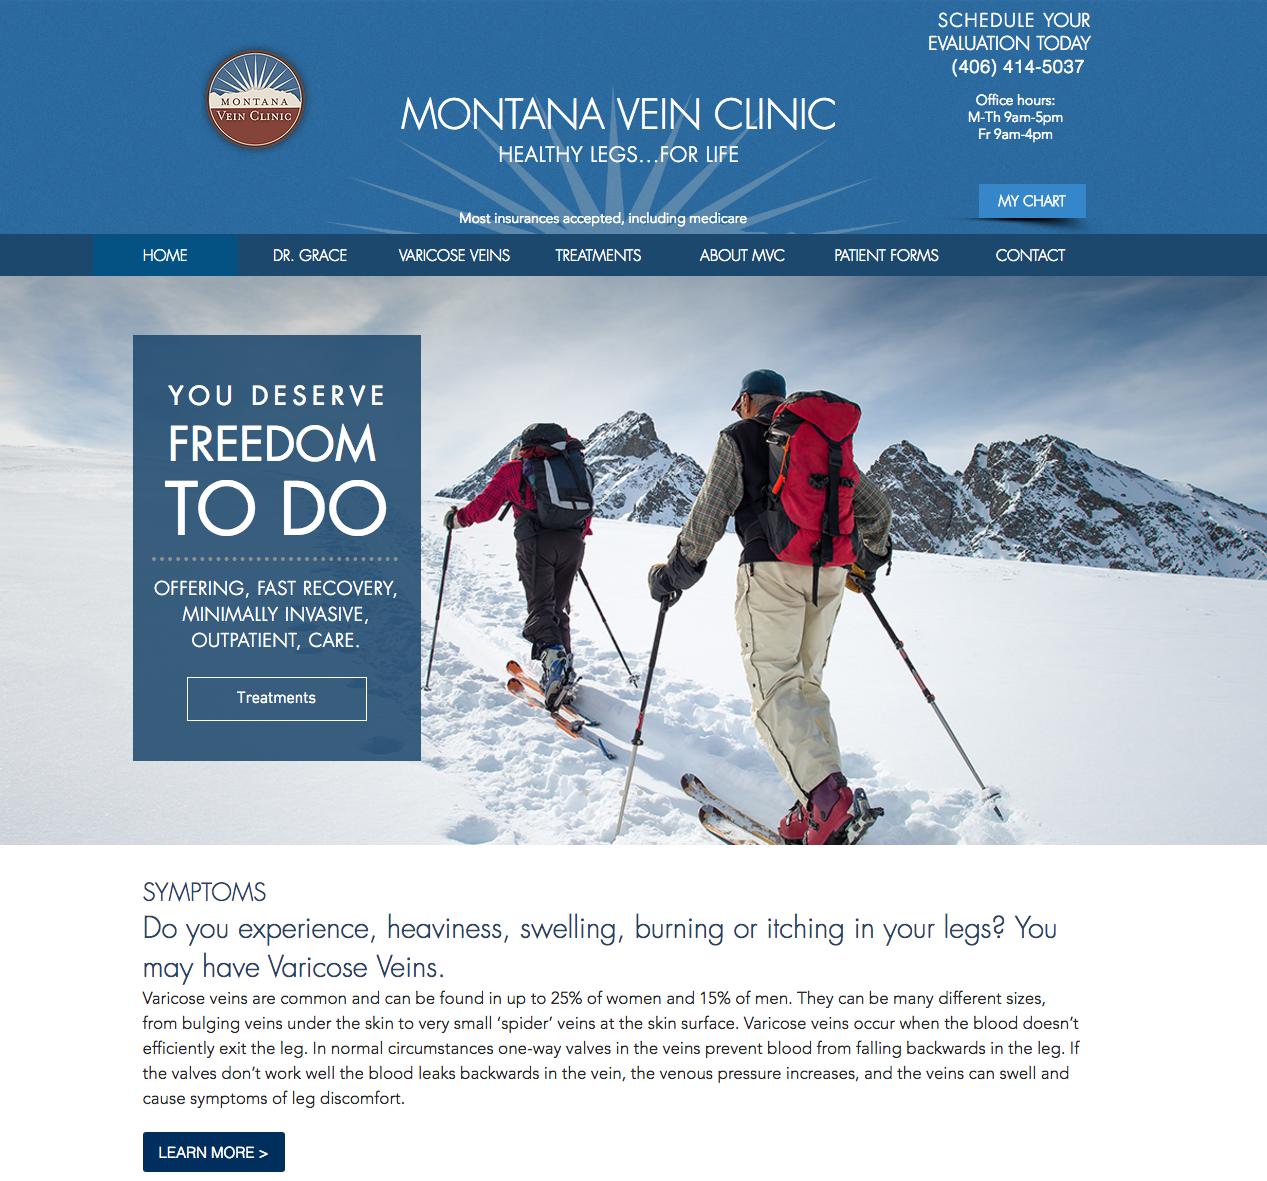 Montana Vein Clinic